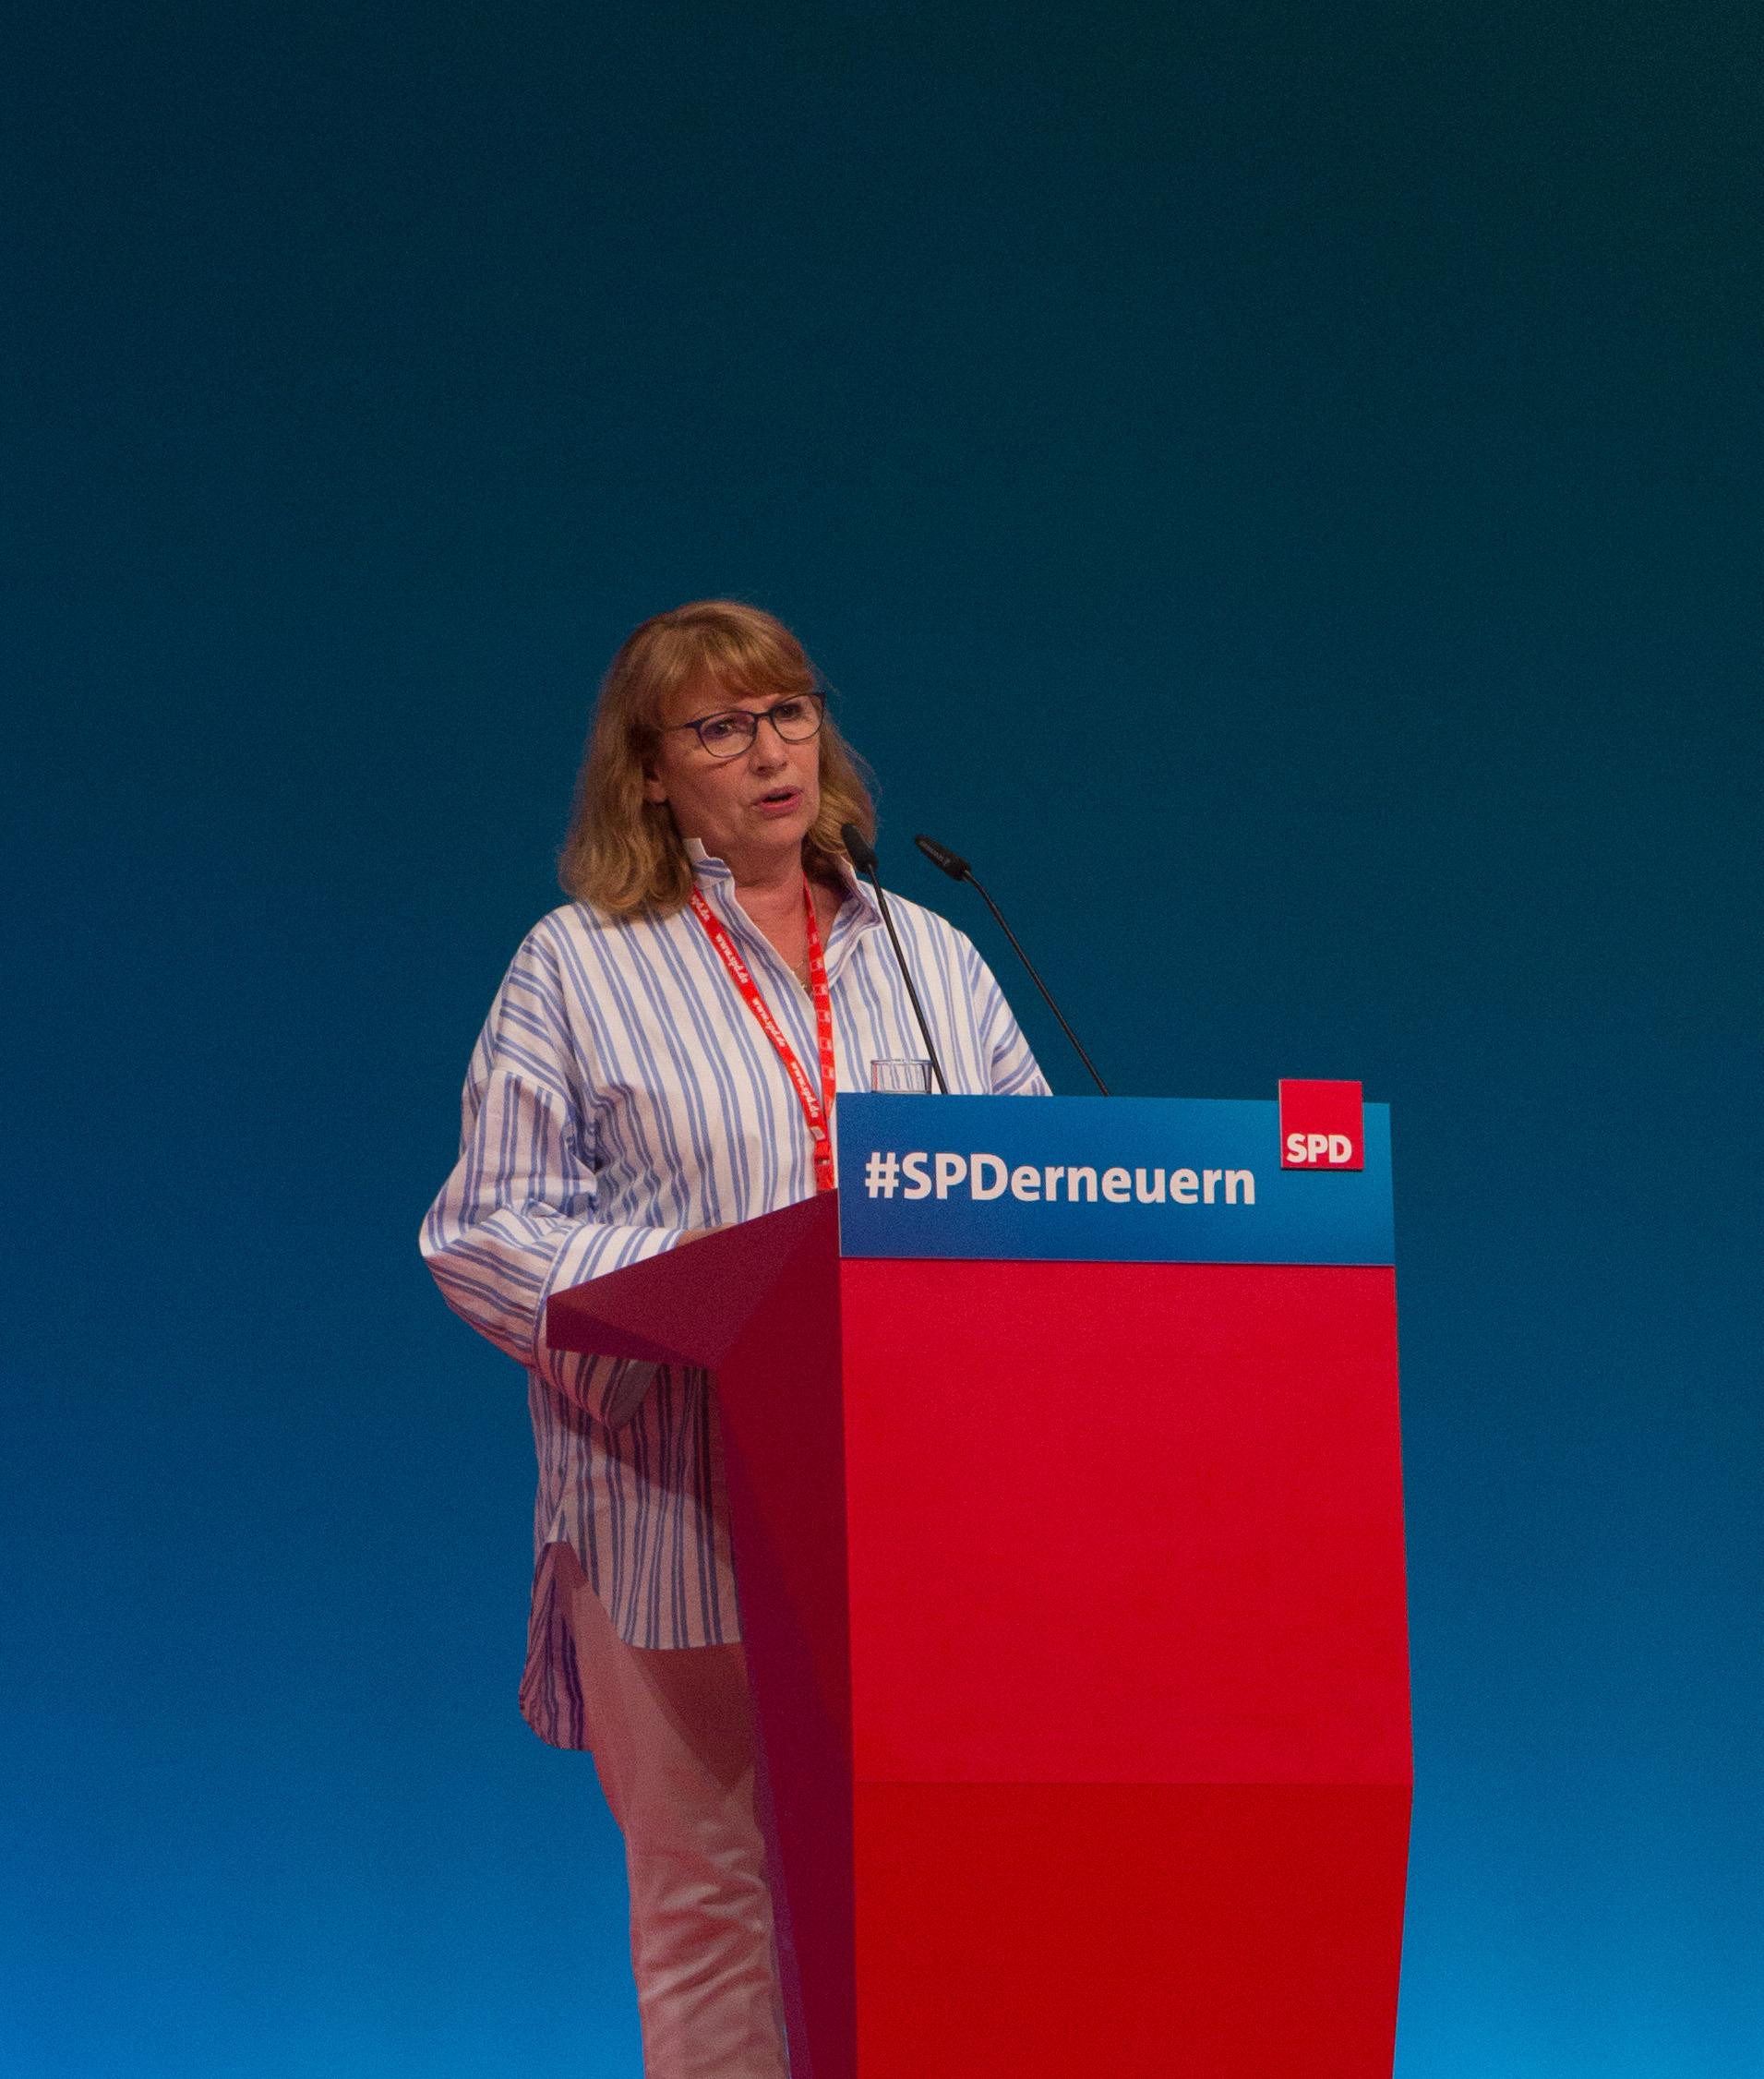 2018-04-22 SPD Bundesparteitag 2018 Wiesbaden-6655.jpg